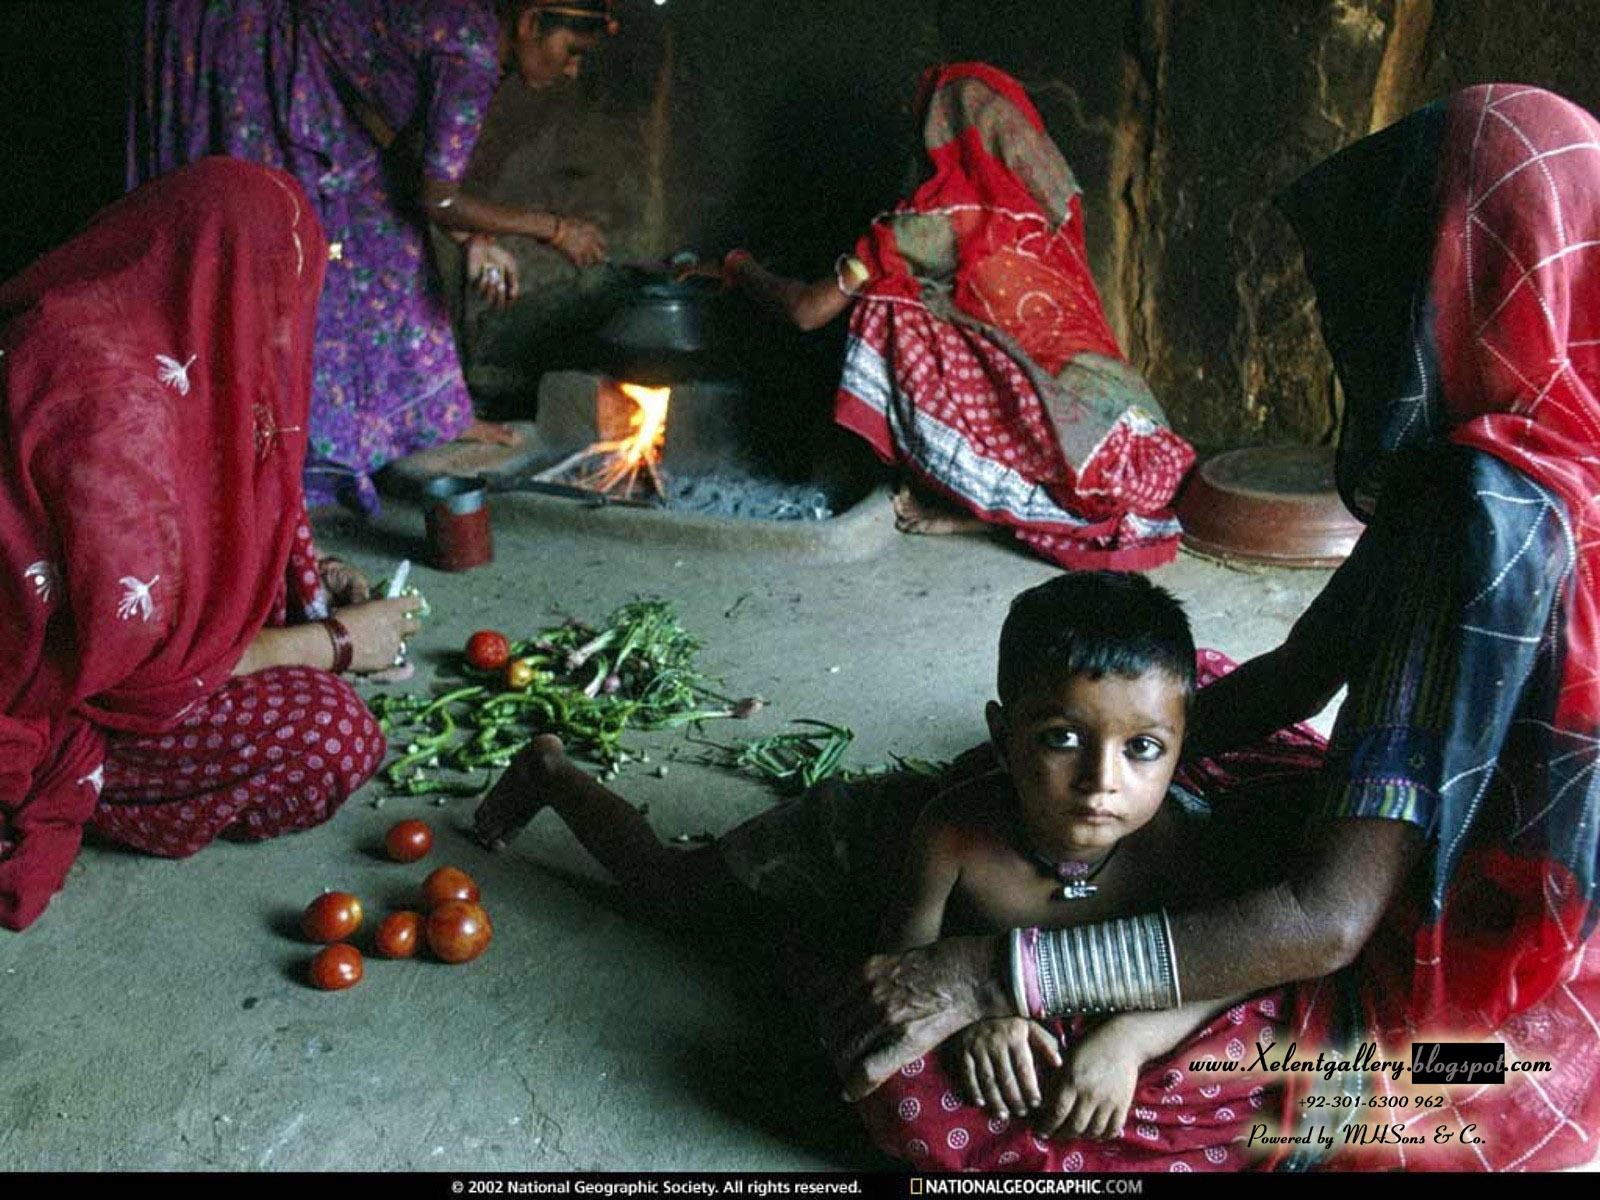 http://2.bp.blogspot.com/-UGcCaFmY5Nc/T9rPUD6YwTI/AAAAAAAABZY/nqNkdHBIbOk/s1600/National+Geographic+Wallpapers+%25289%2529.JPG